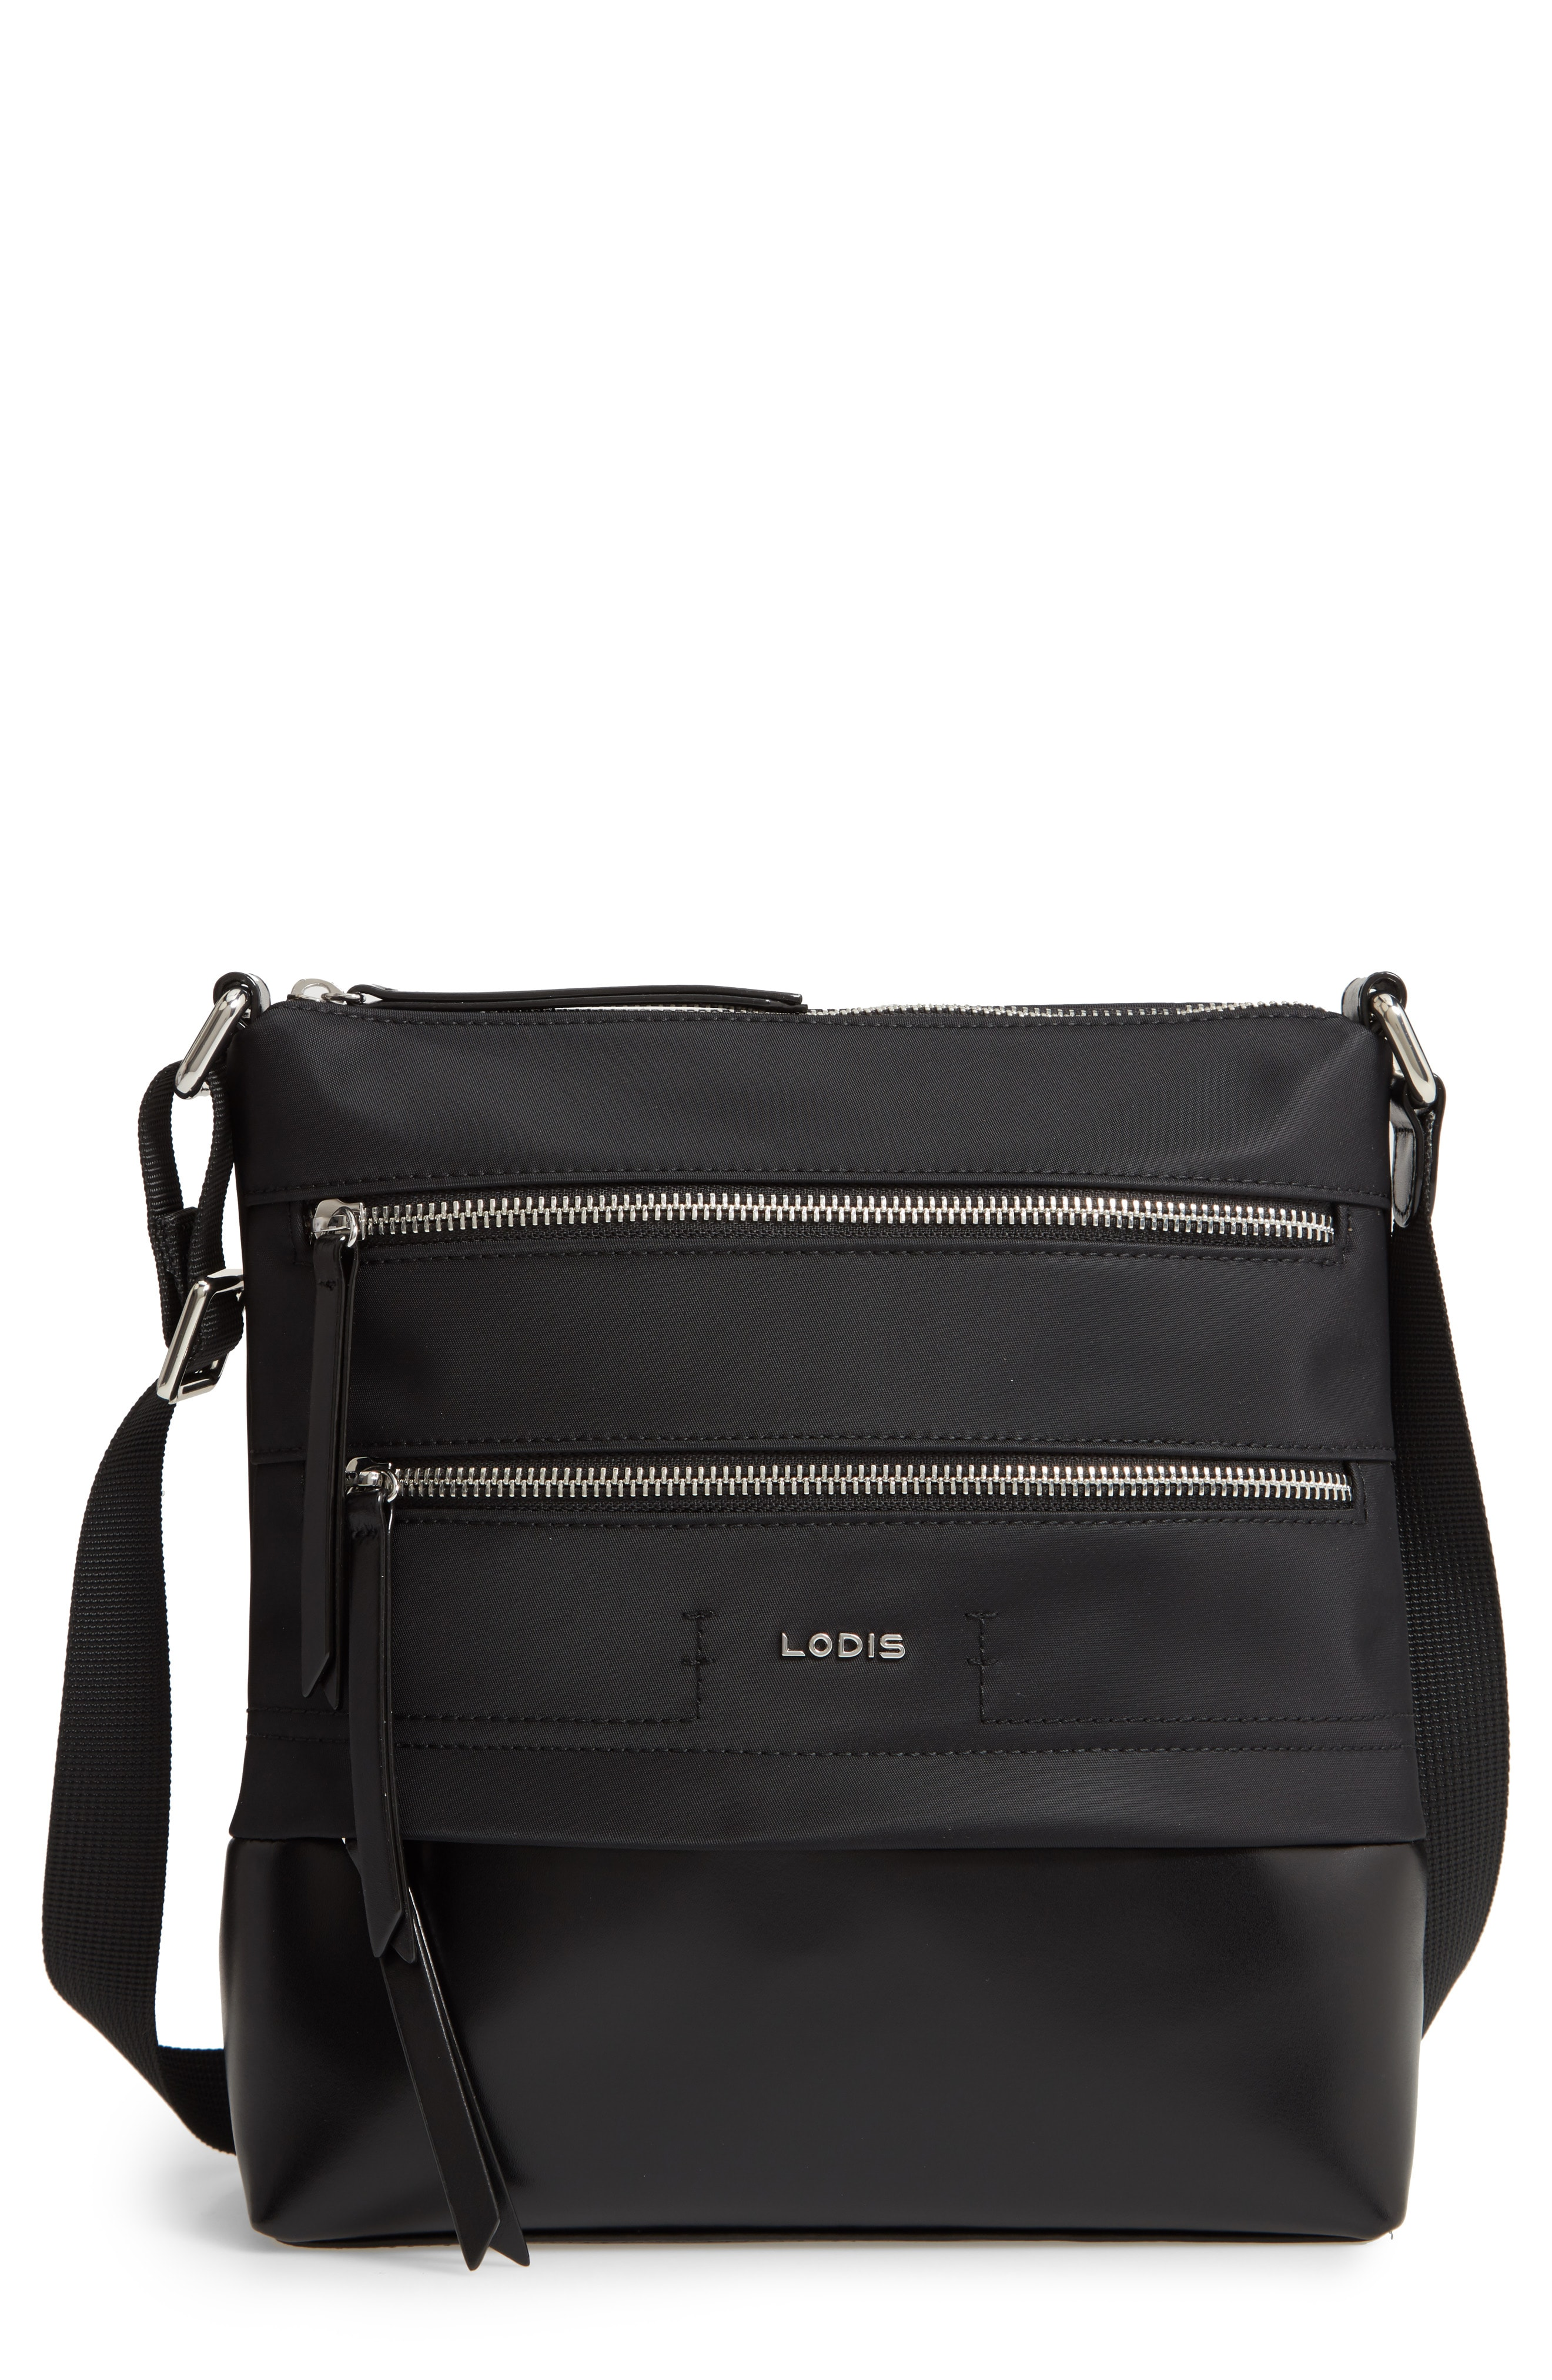 LODIS Los Angeles Wanda Nylon Sport RFID Travel Crossbody Bag